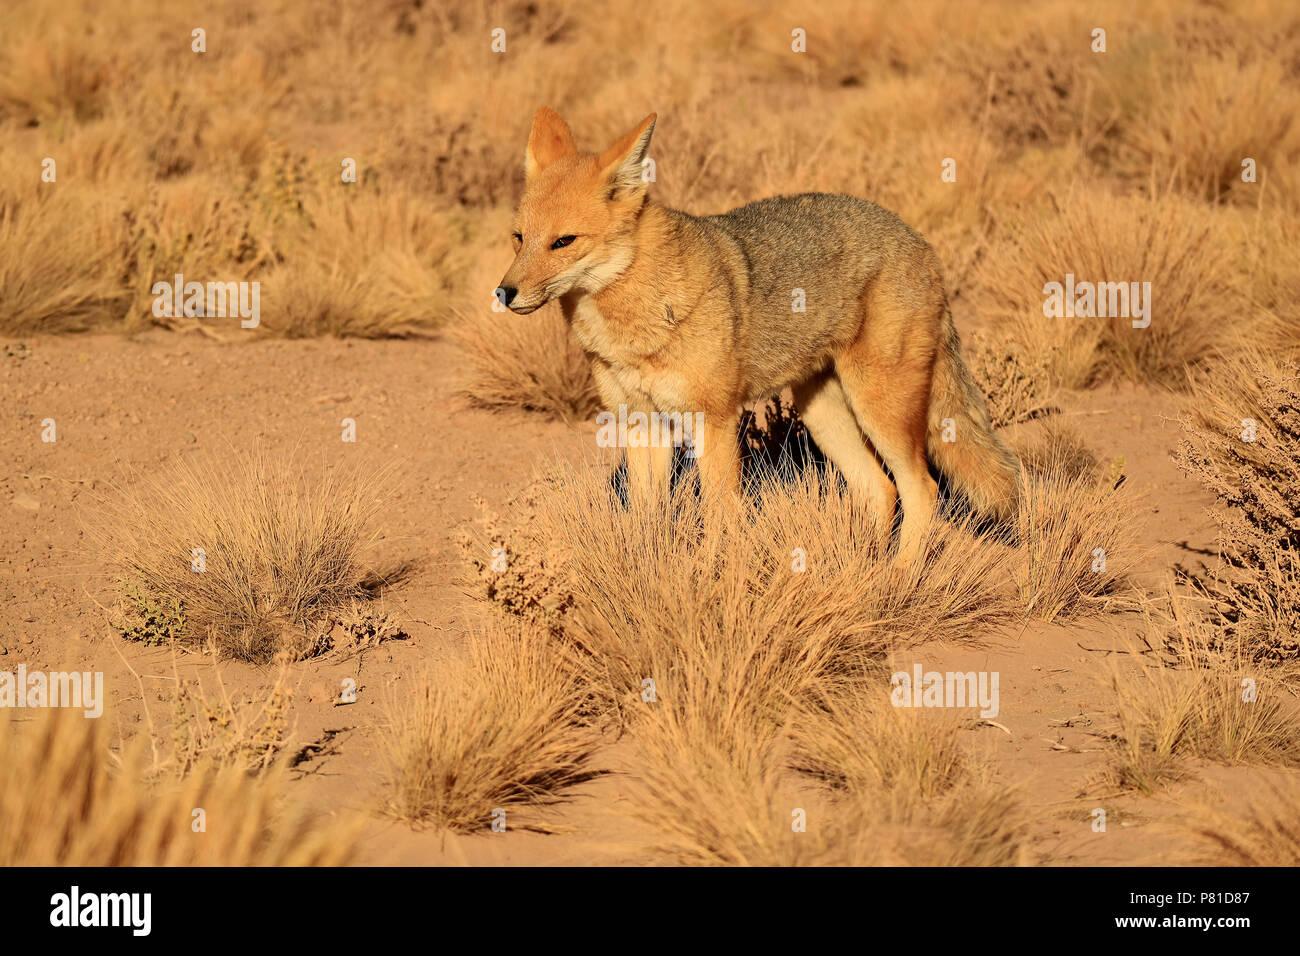 Andean Fox or Zorro Culpeo in the Desert Brush Field, Altiplano of Chile, South America - Stock Image